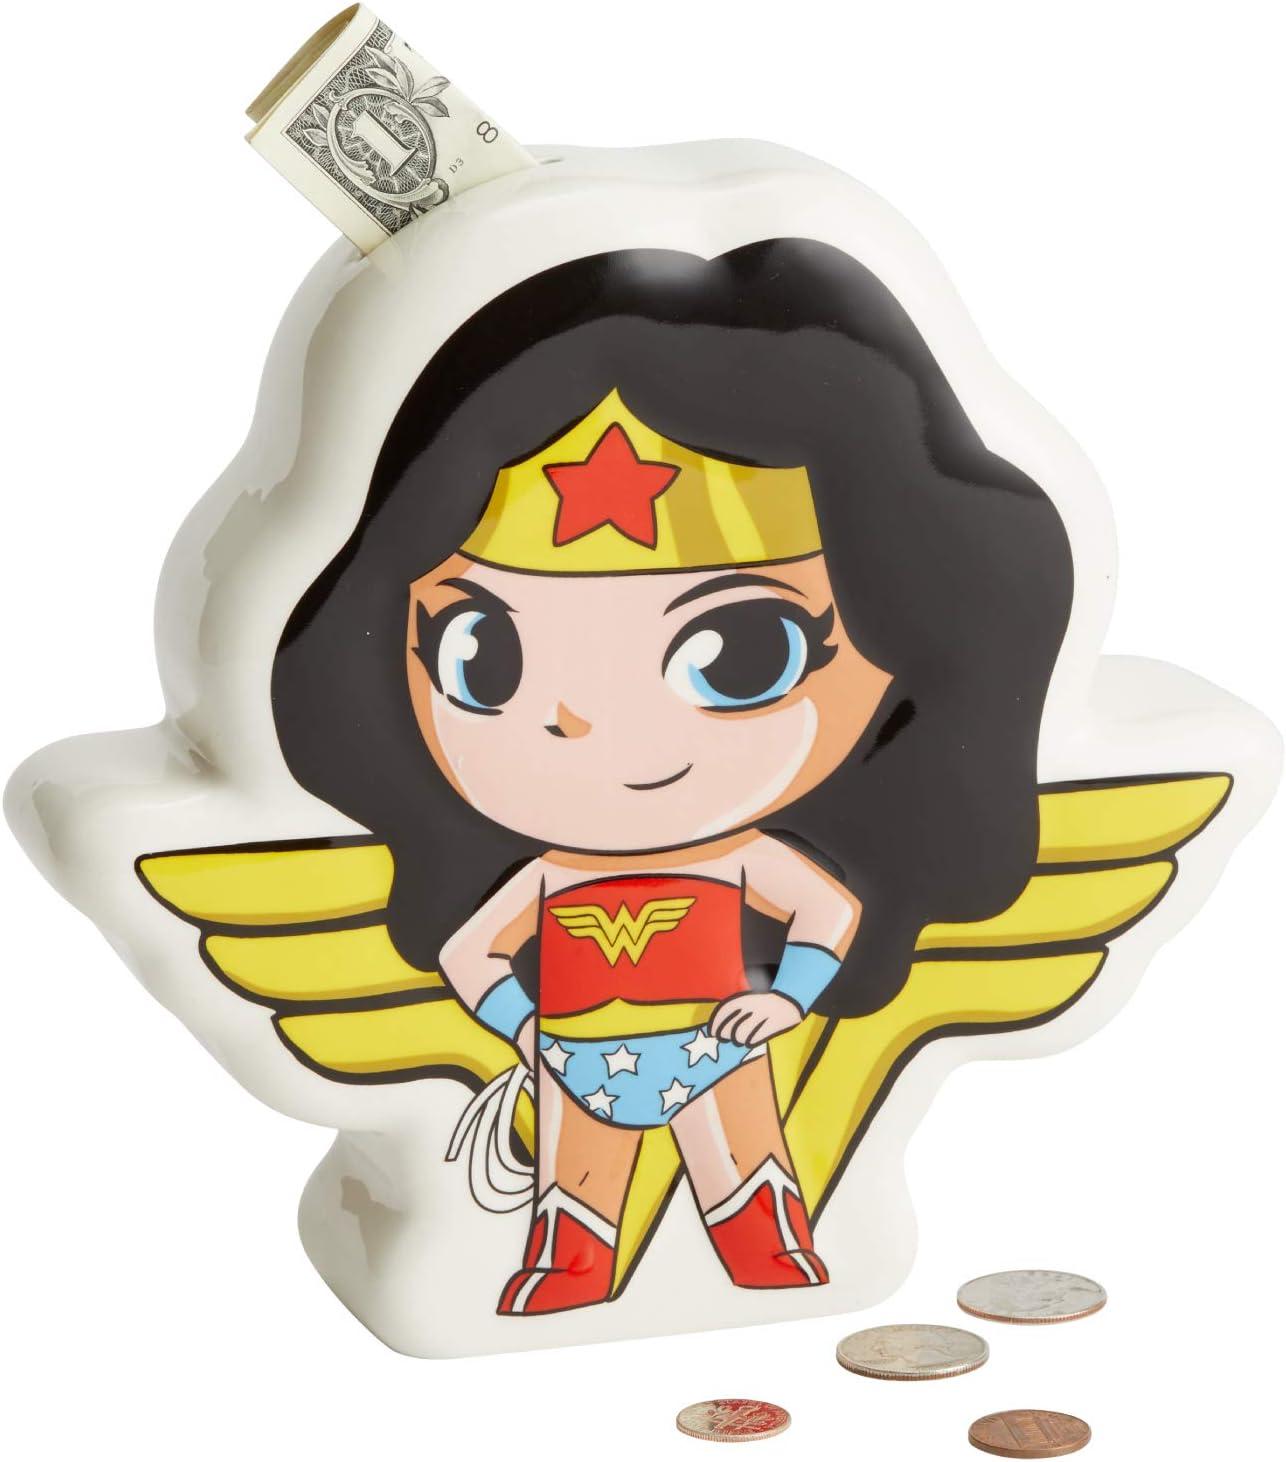 Enesco DC Comics Super friends Wonder Woman Coin Bank